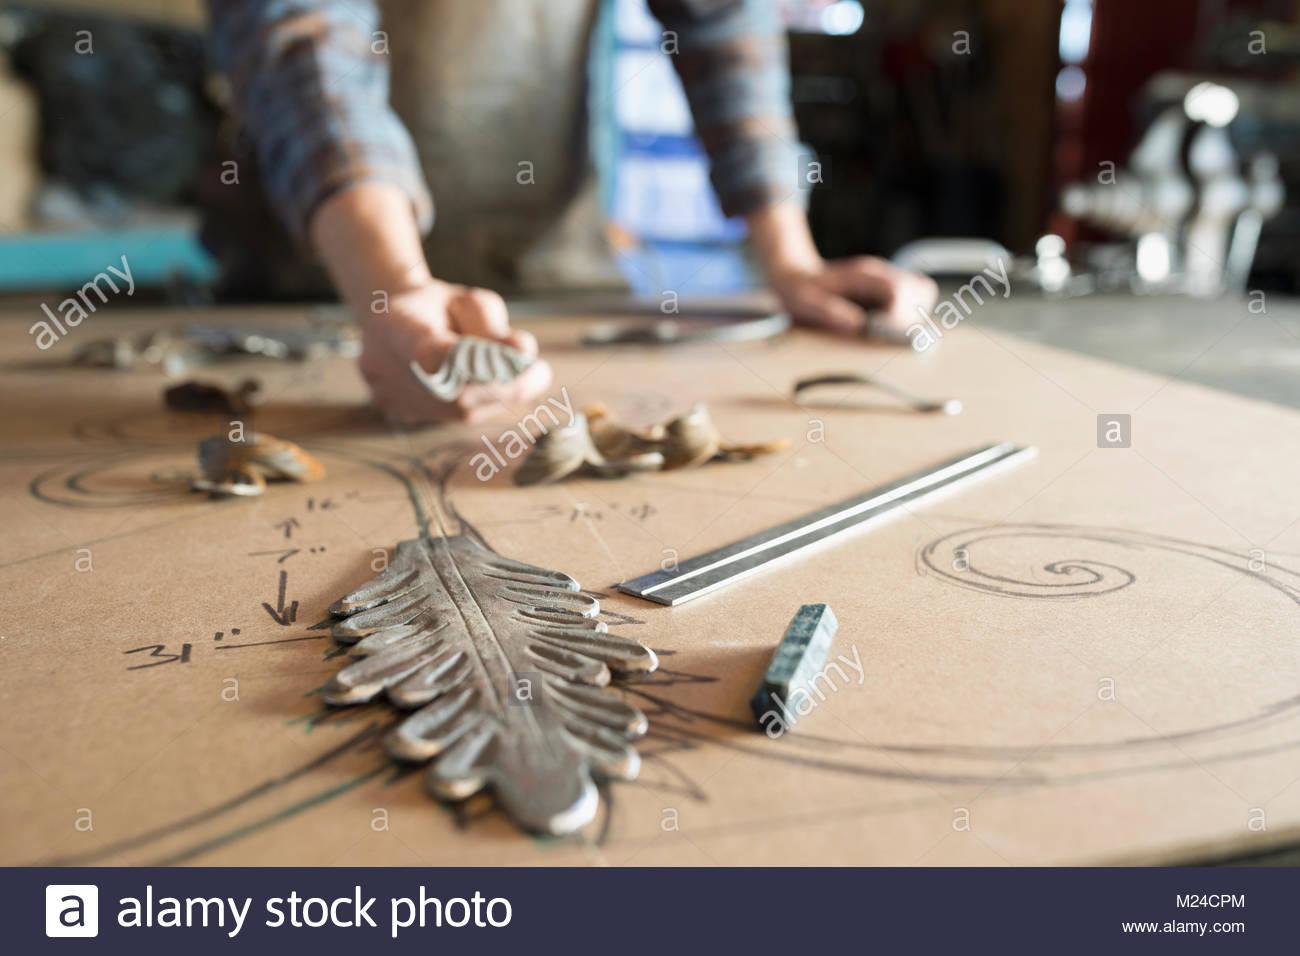 Creative blacksmith planning design - Stock Image